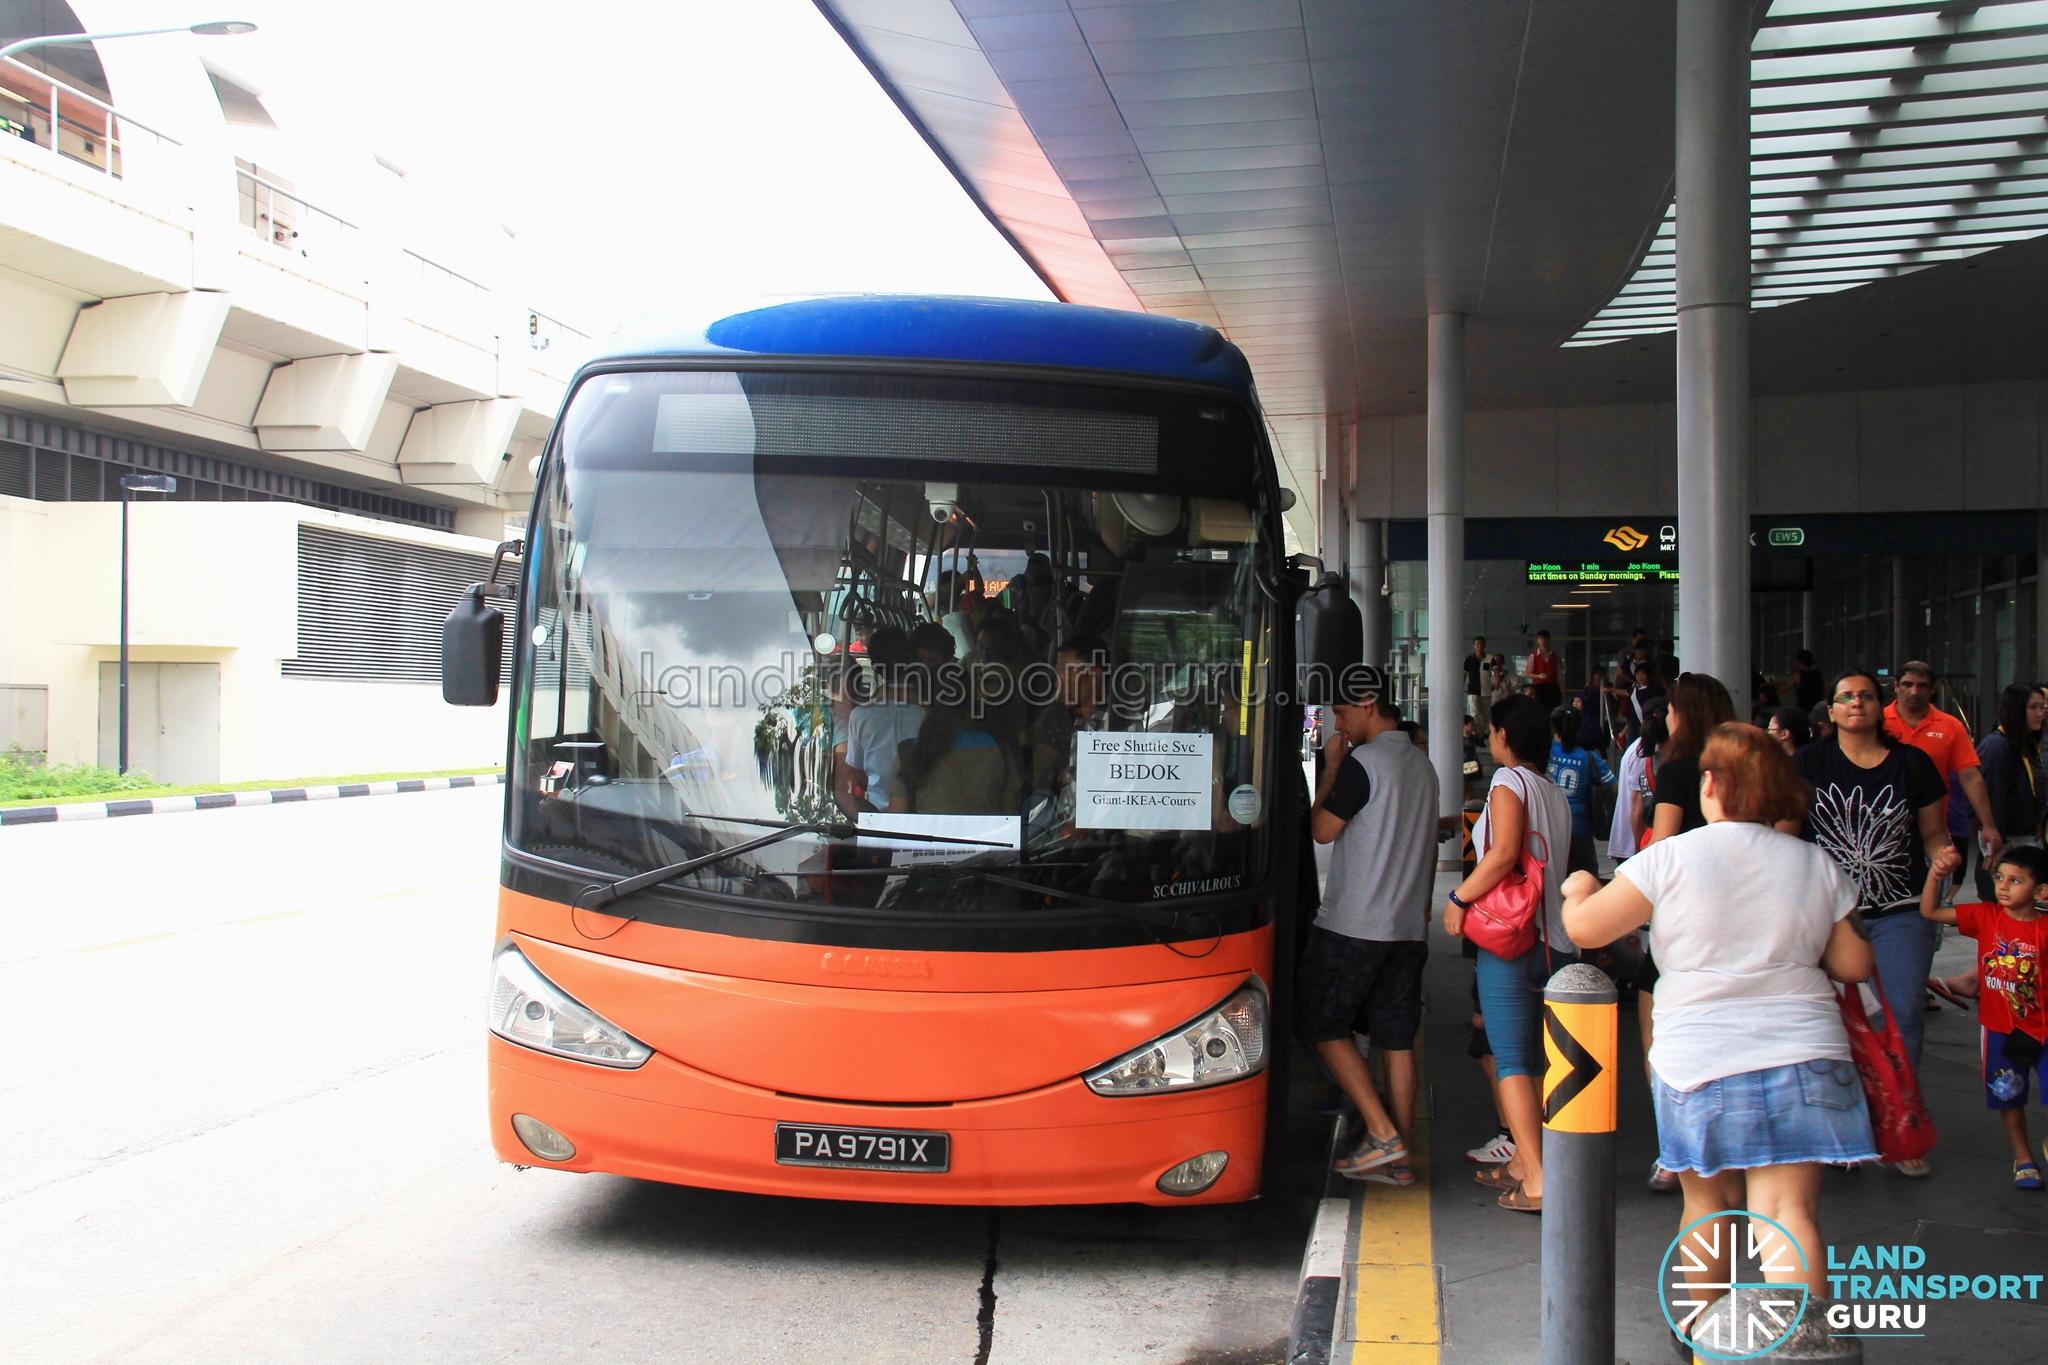 tampines retail park free shuttle bus services land transport guru. Black Bedroom Furniture Sets. Home Design Ideas